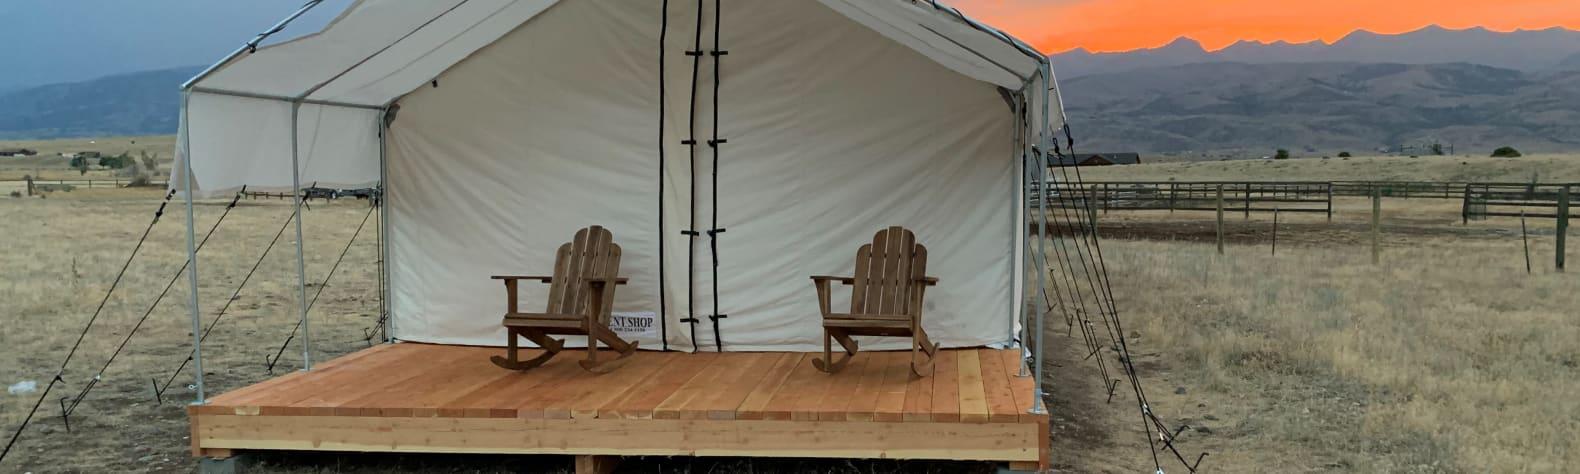 Yellowstone Dreamin Camp